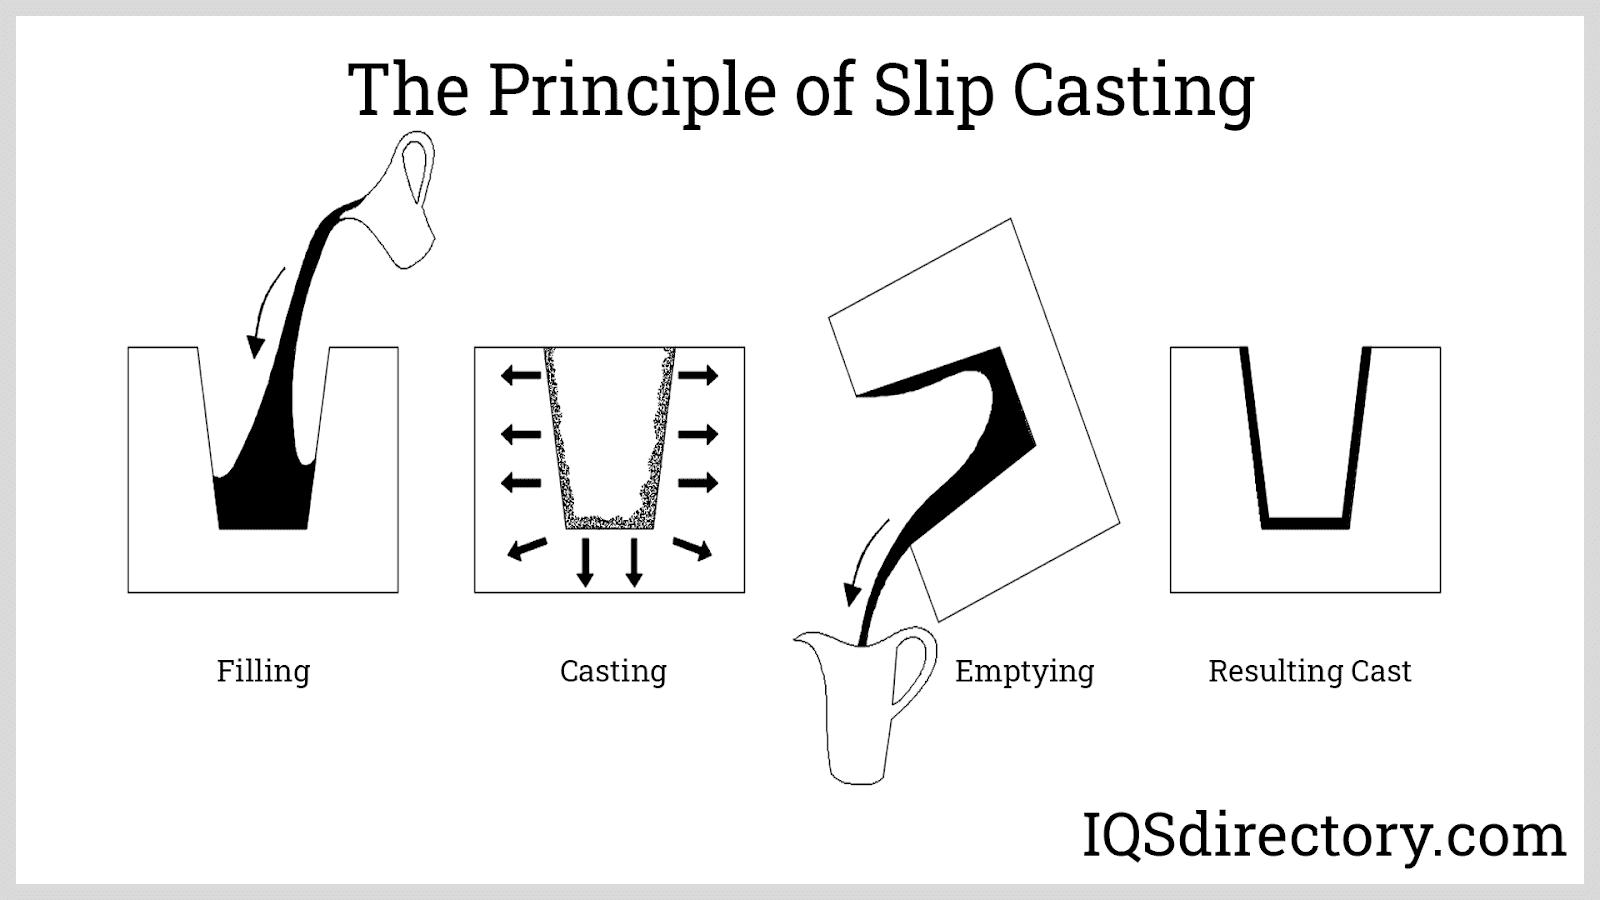 The Principle of Slip Casting